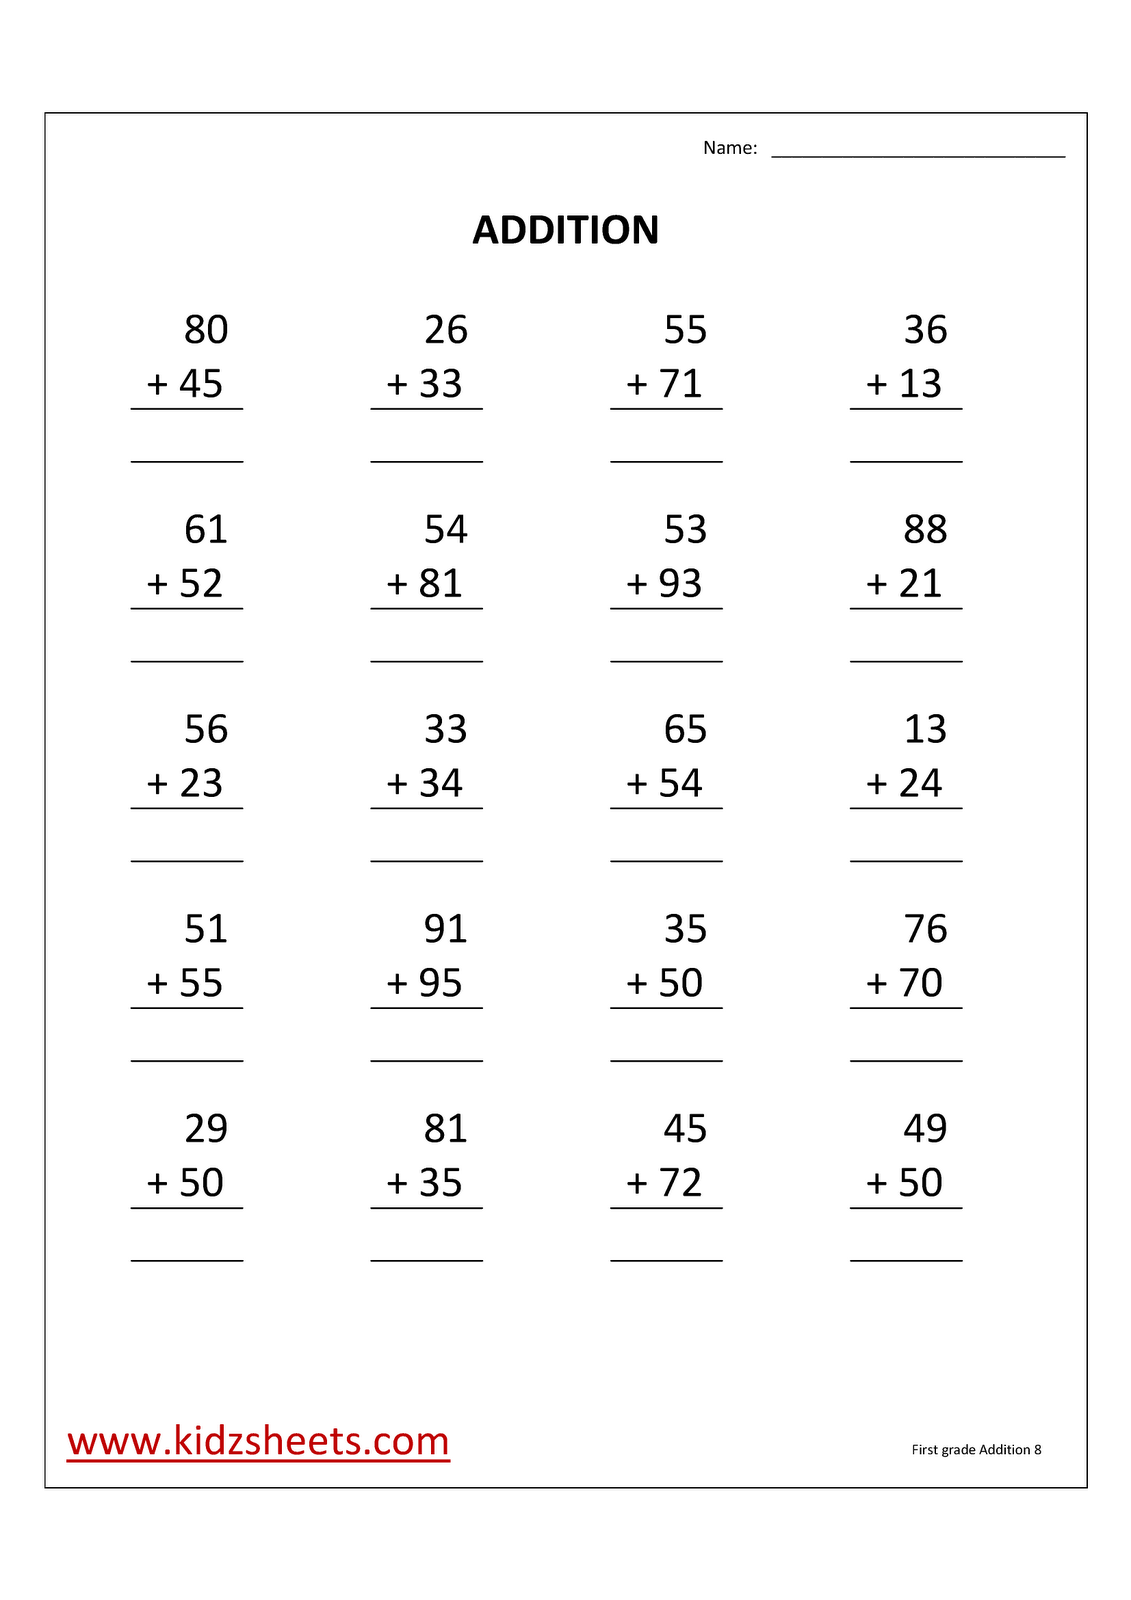 Kidz Worksheets First Grade Addition Worksheet8